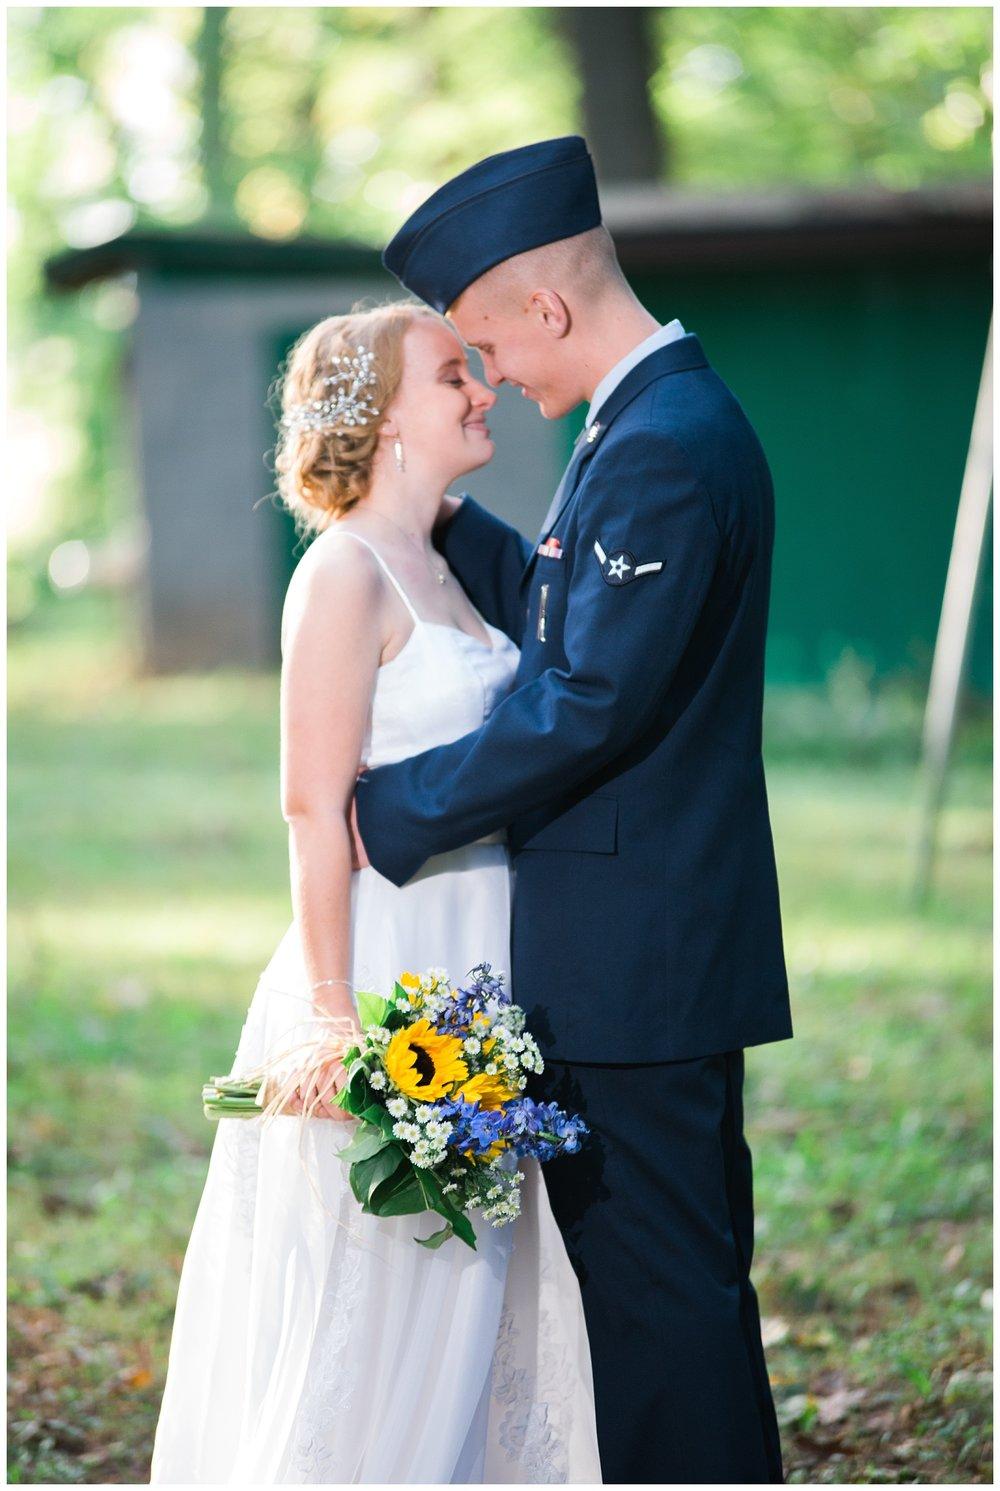 Lebanon Wedding Photographer | Fall Wedding | Air Force Wedding